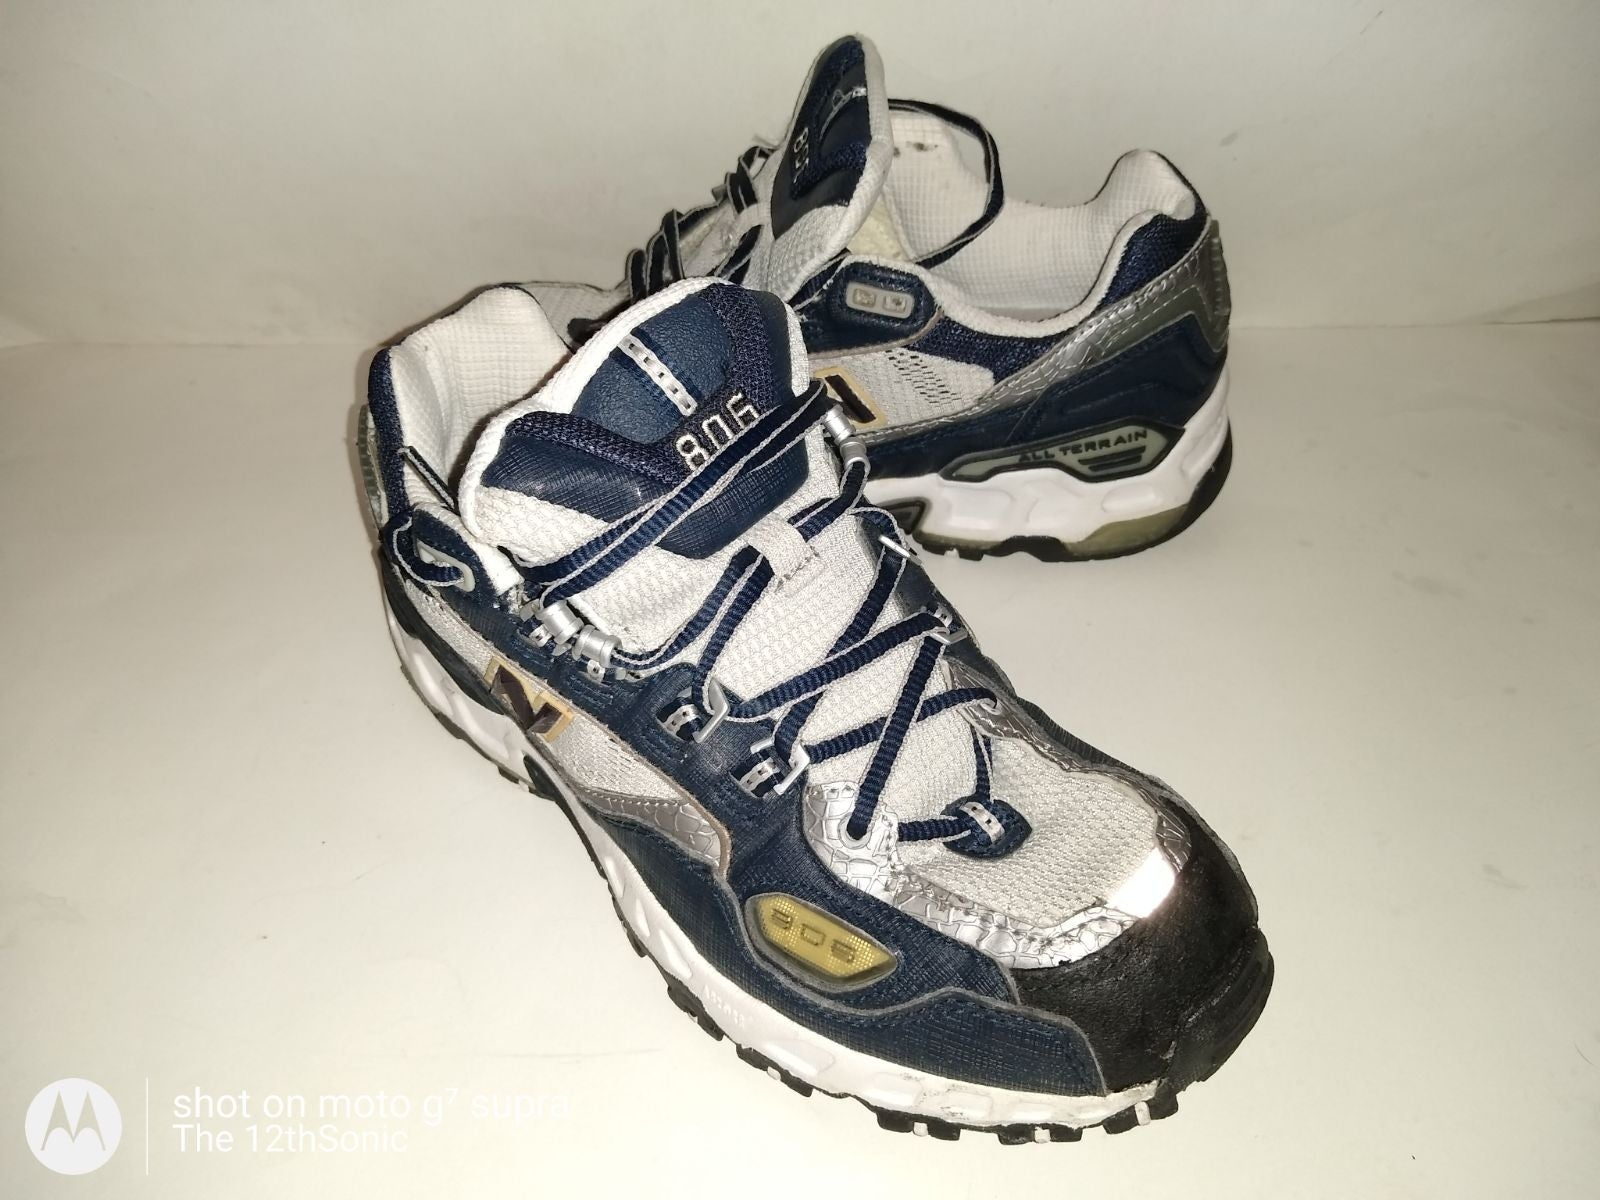 New Balance 806 All Terrain Shoes 7.5